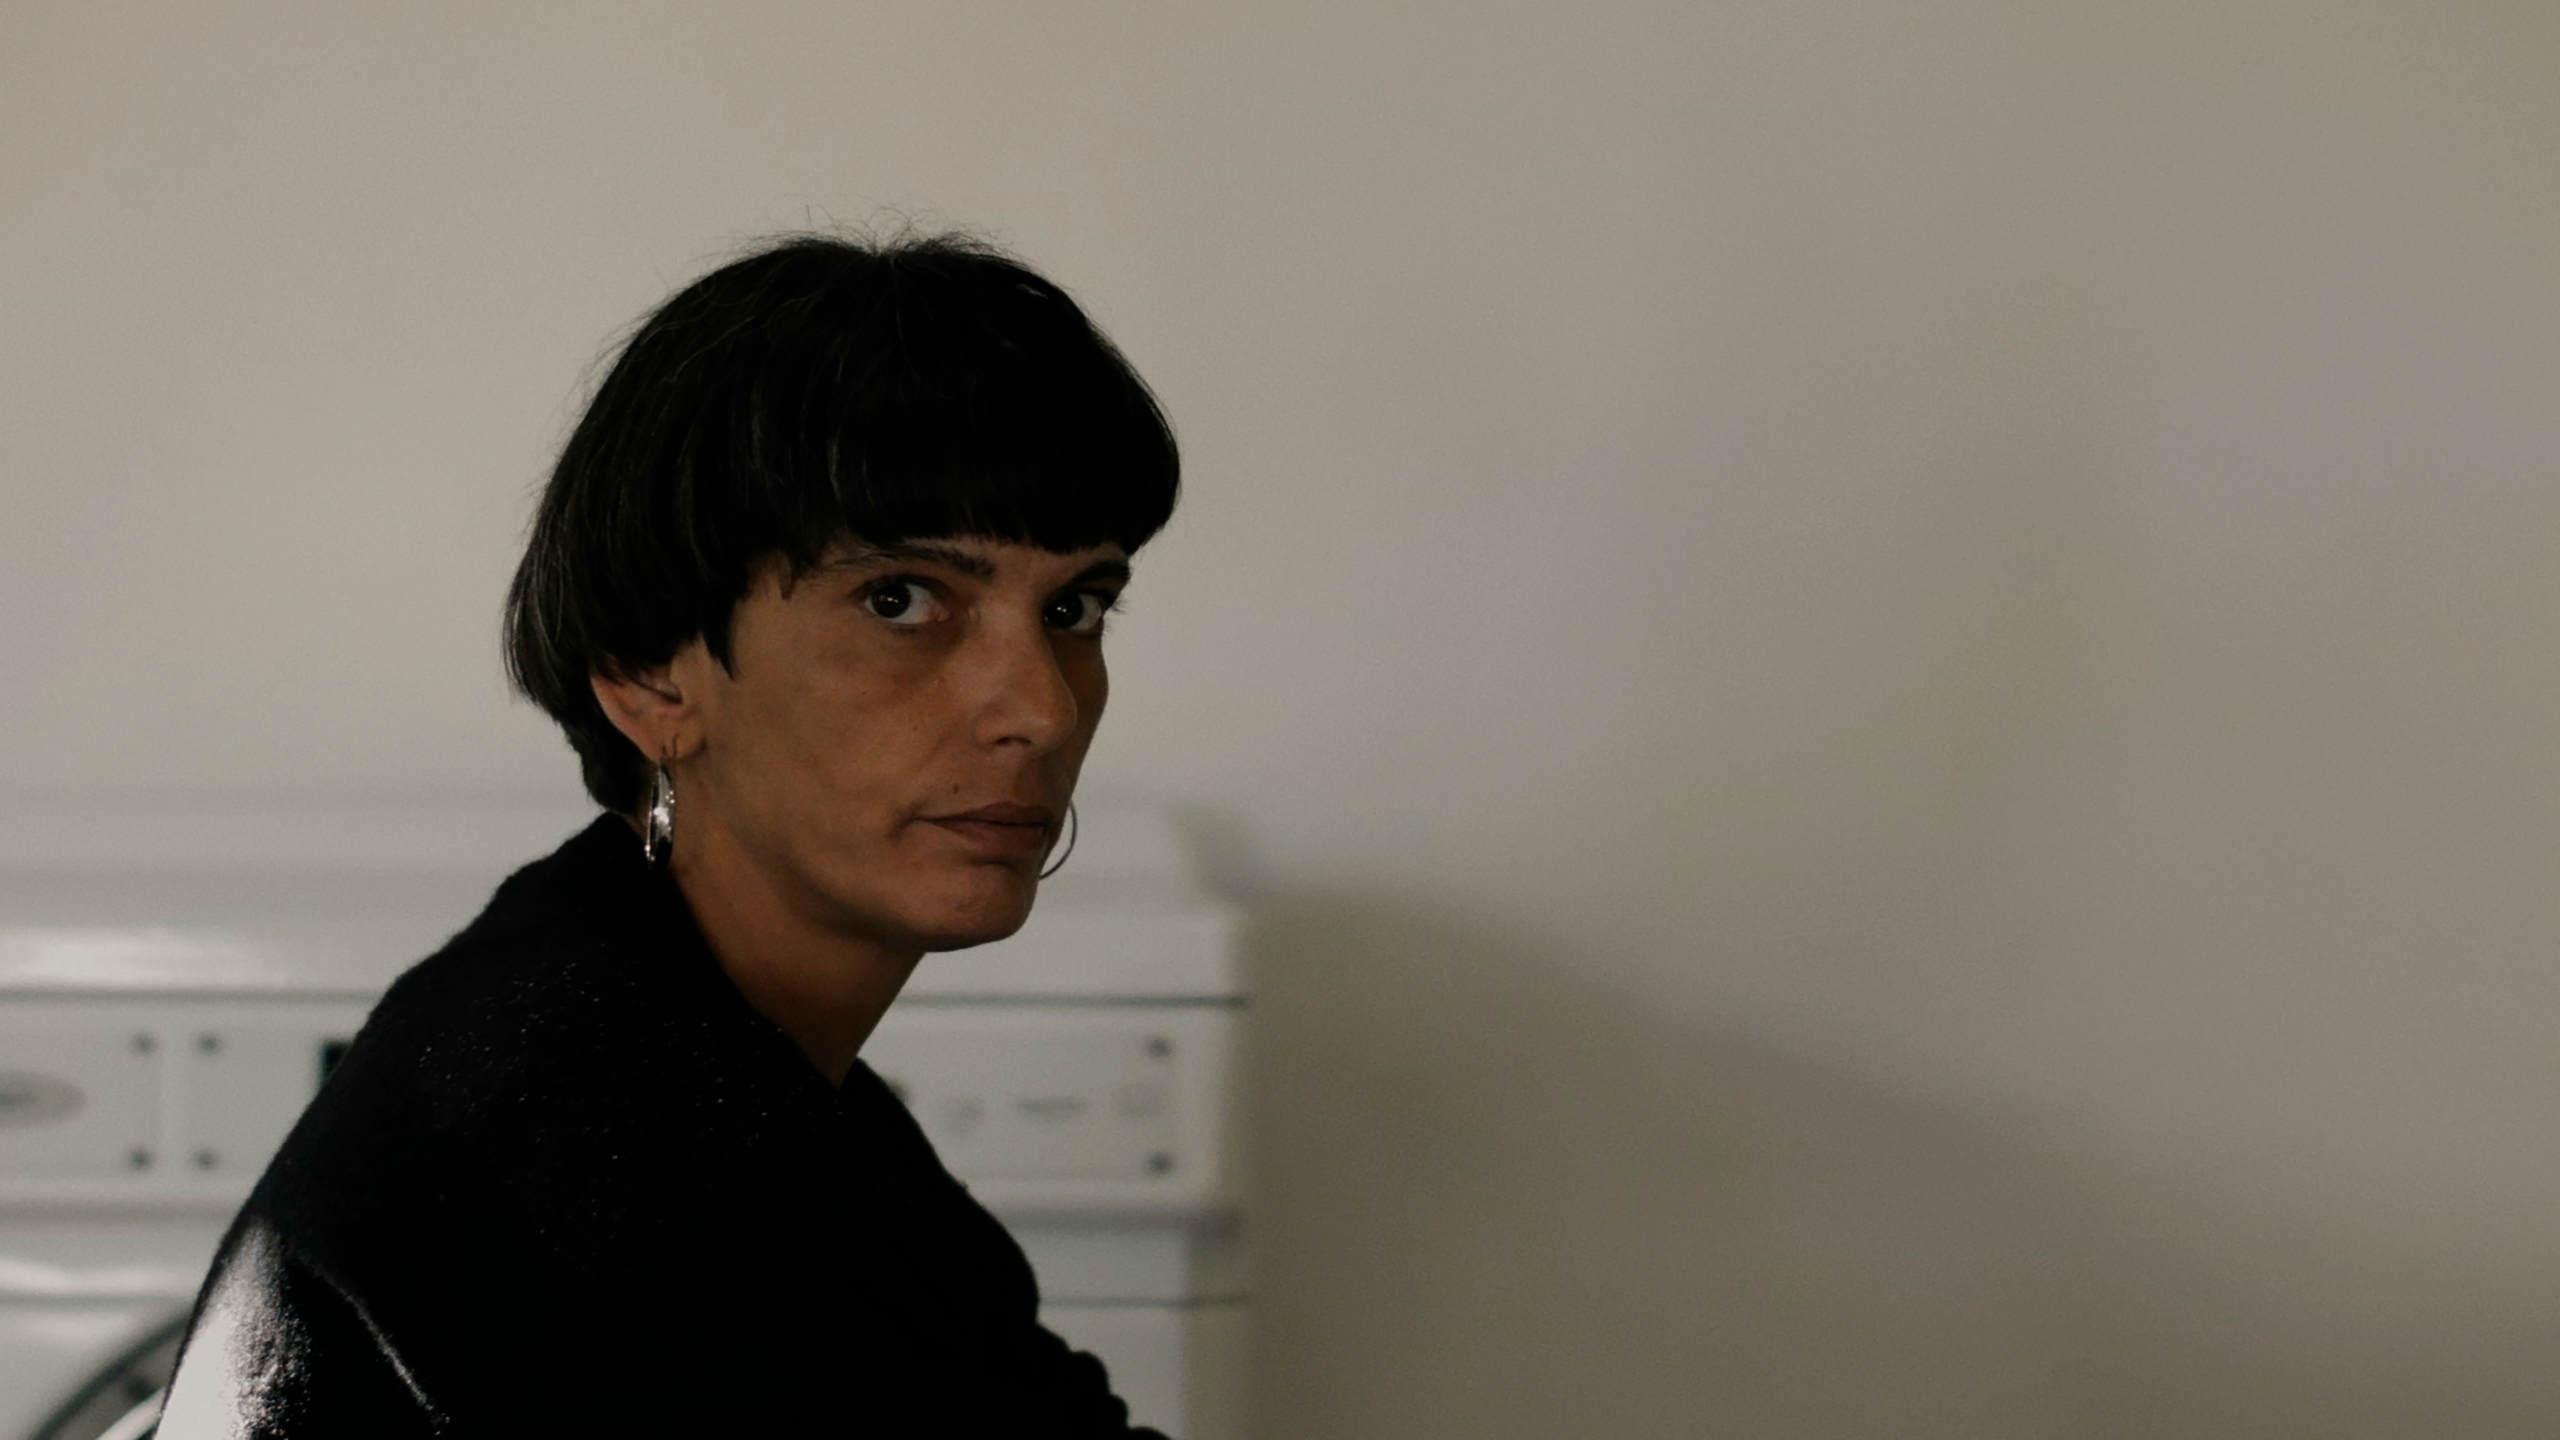 The First Woman - Miguel Eek - La primera mujer - Still